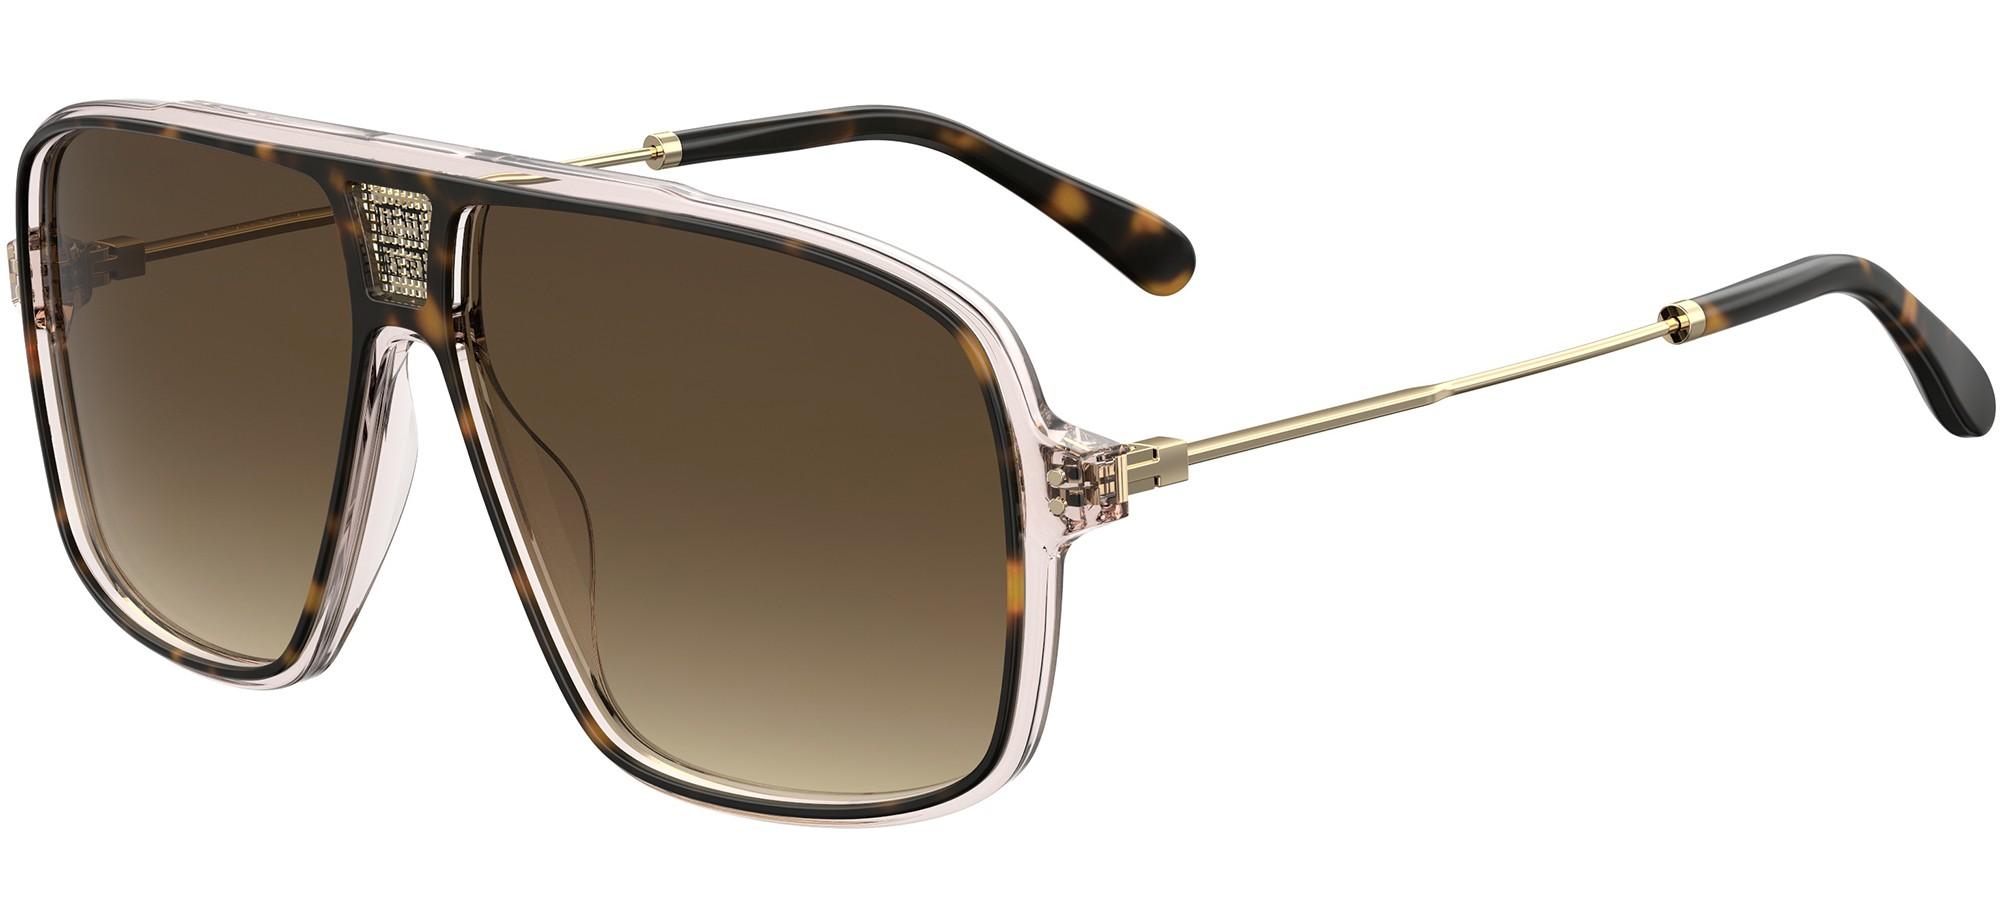 Givenchy zonnebrillen GV 7138/S